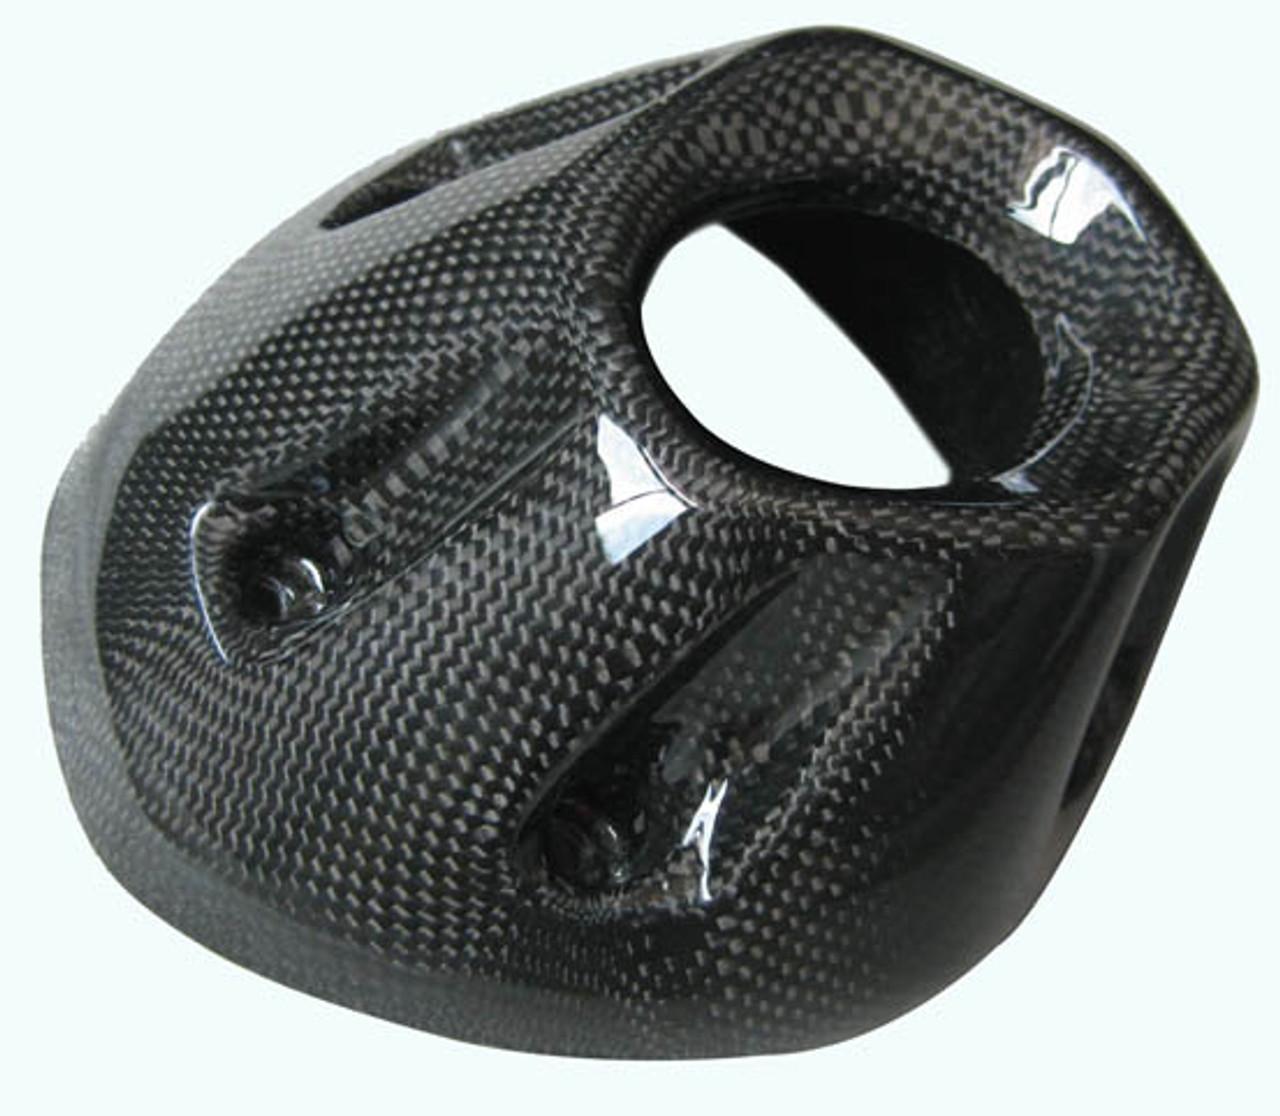 Glossy Plain Weave Carbon Fiber Heat Shield Upper for Yamaha FZ1 06 - 09